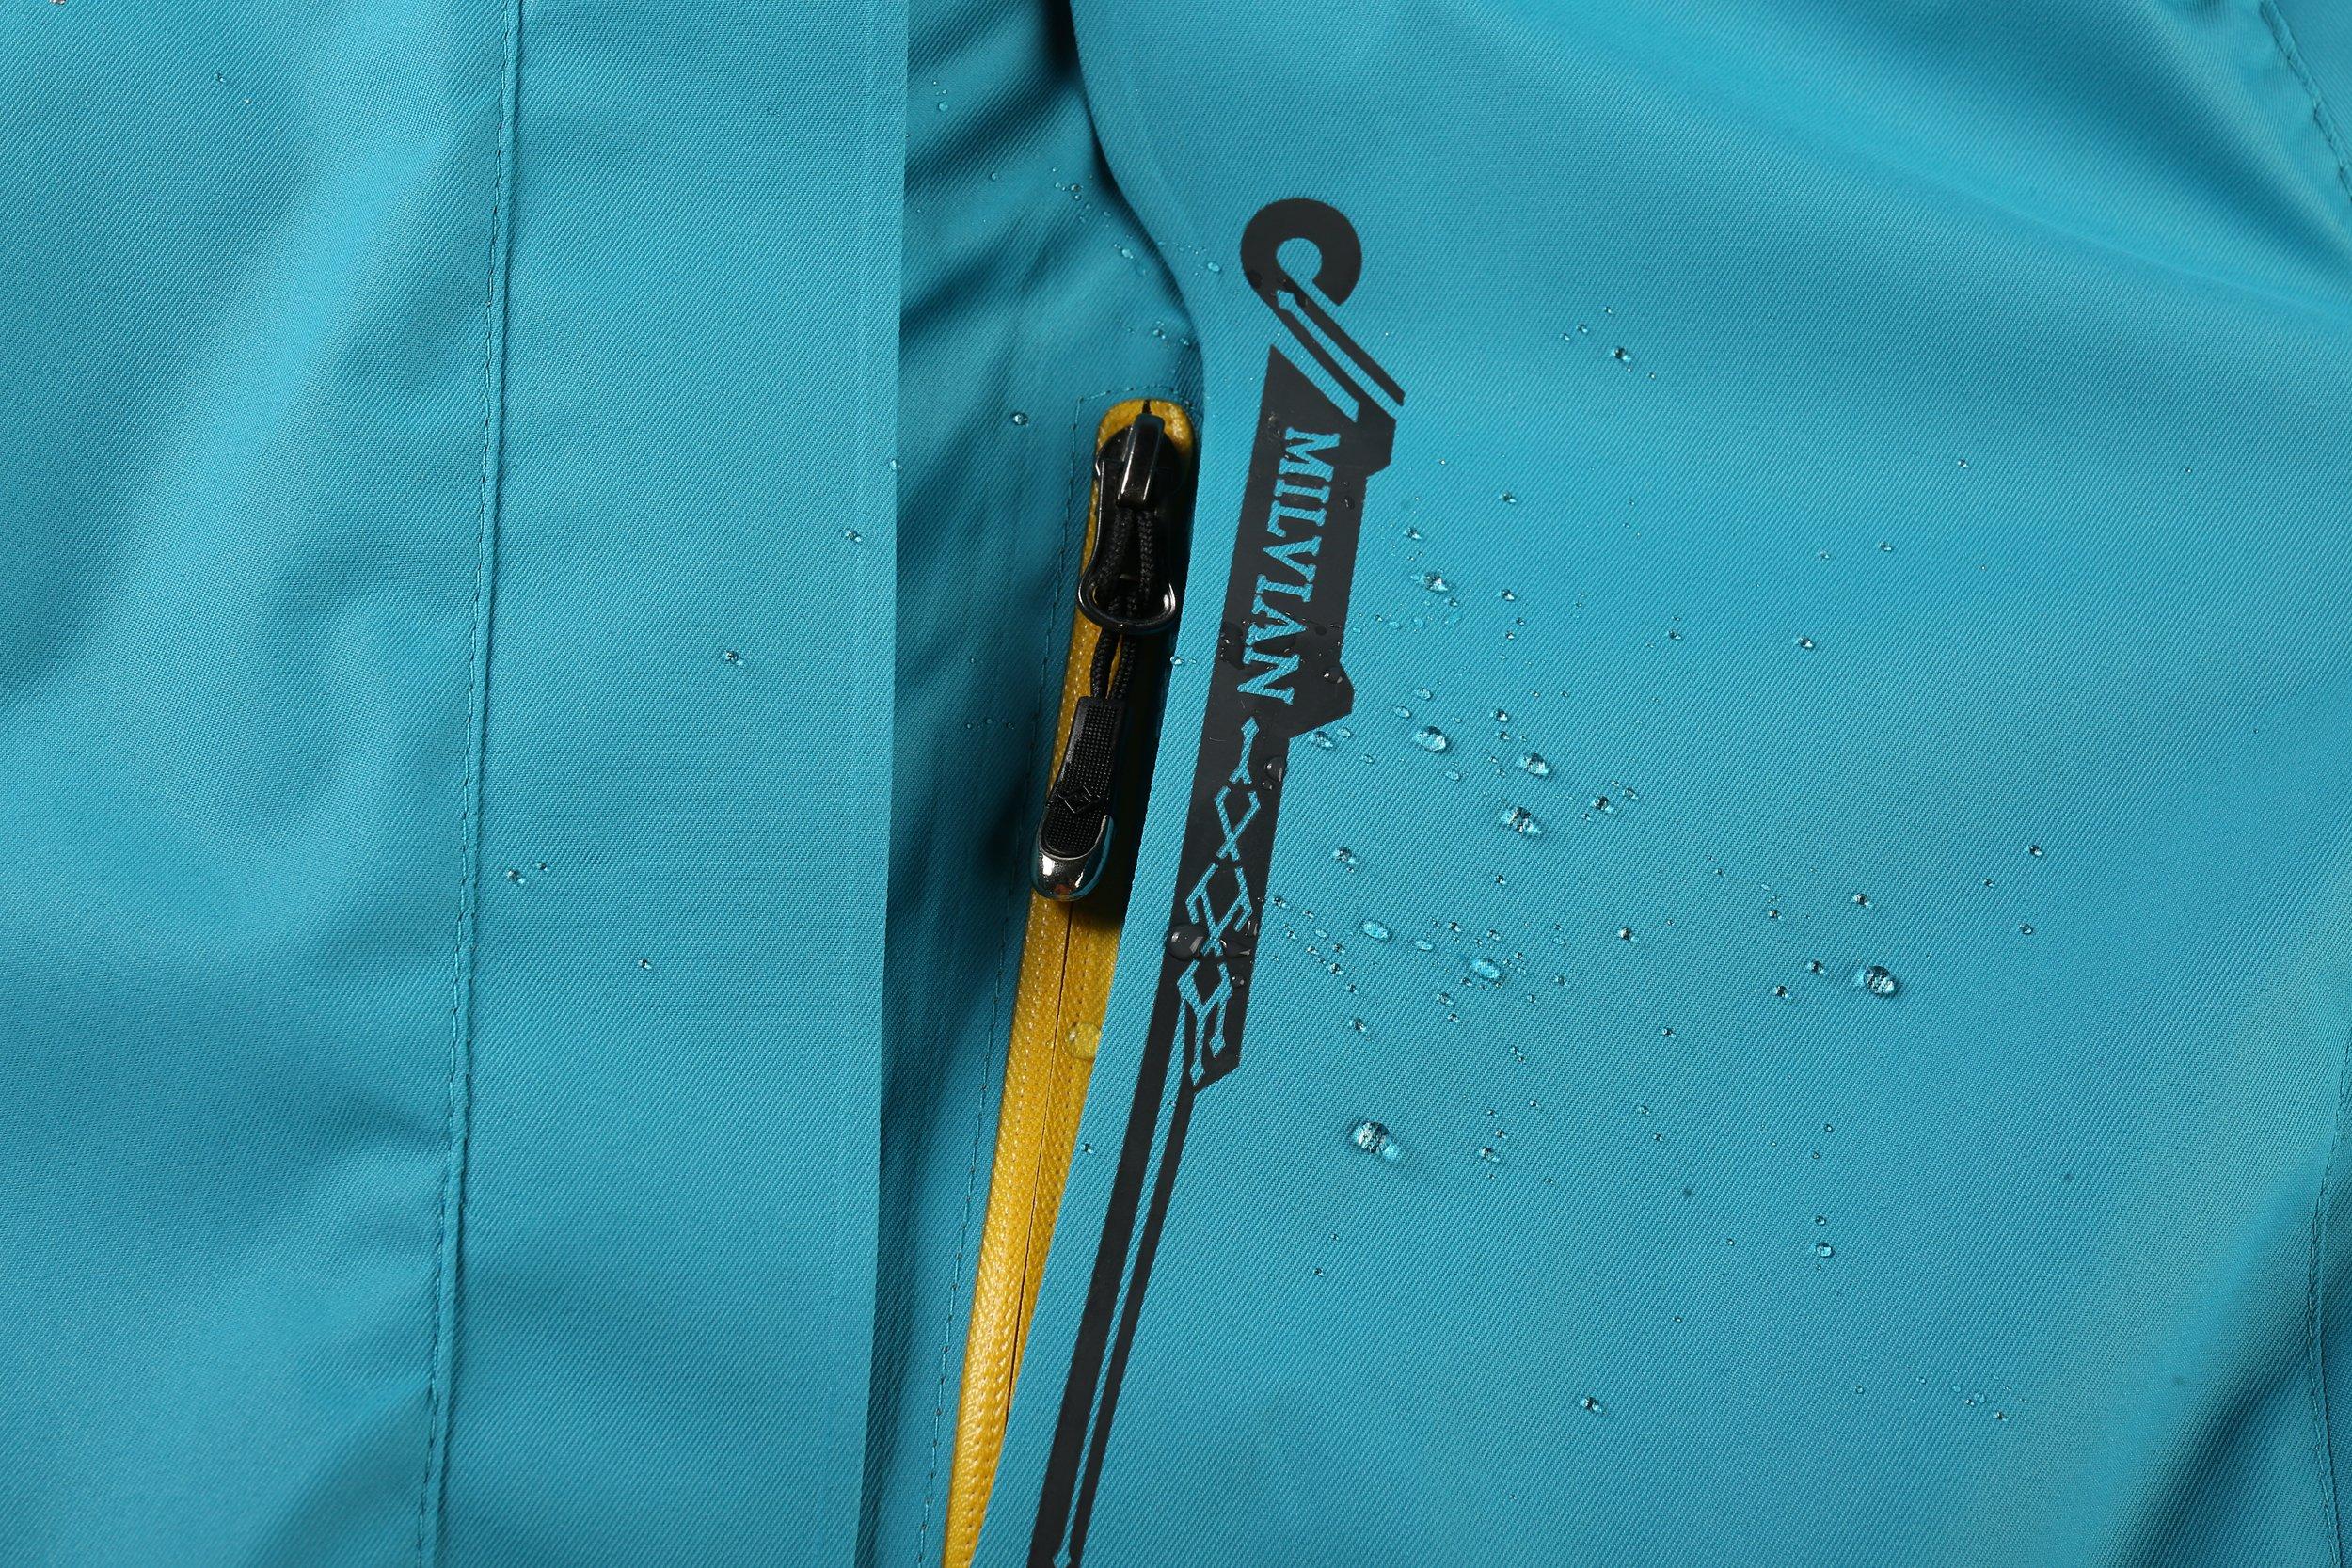 Women Hooded Front-zipper Multifunctional Waterproof Lightweight Hiking Climbing Raincoat Outdoor Sports Jackets&Pants…